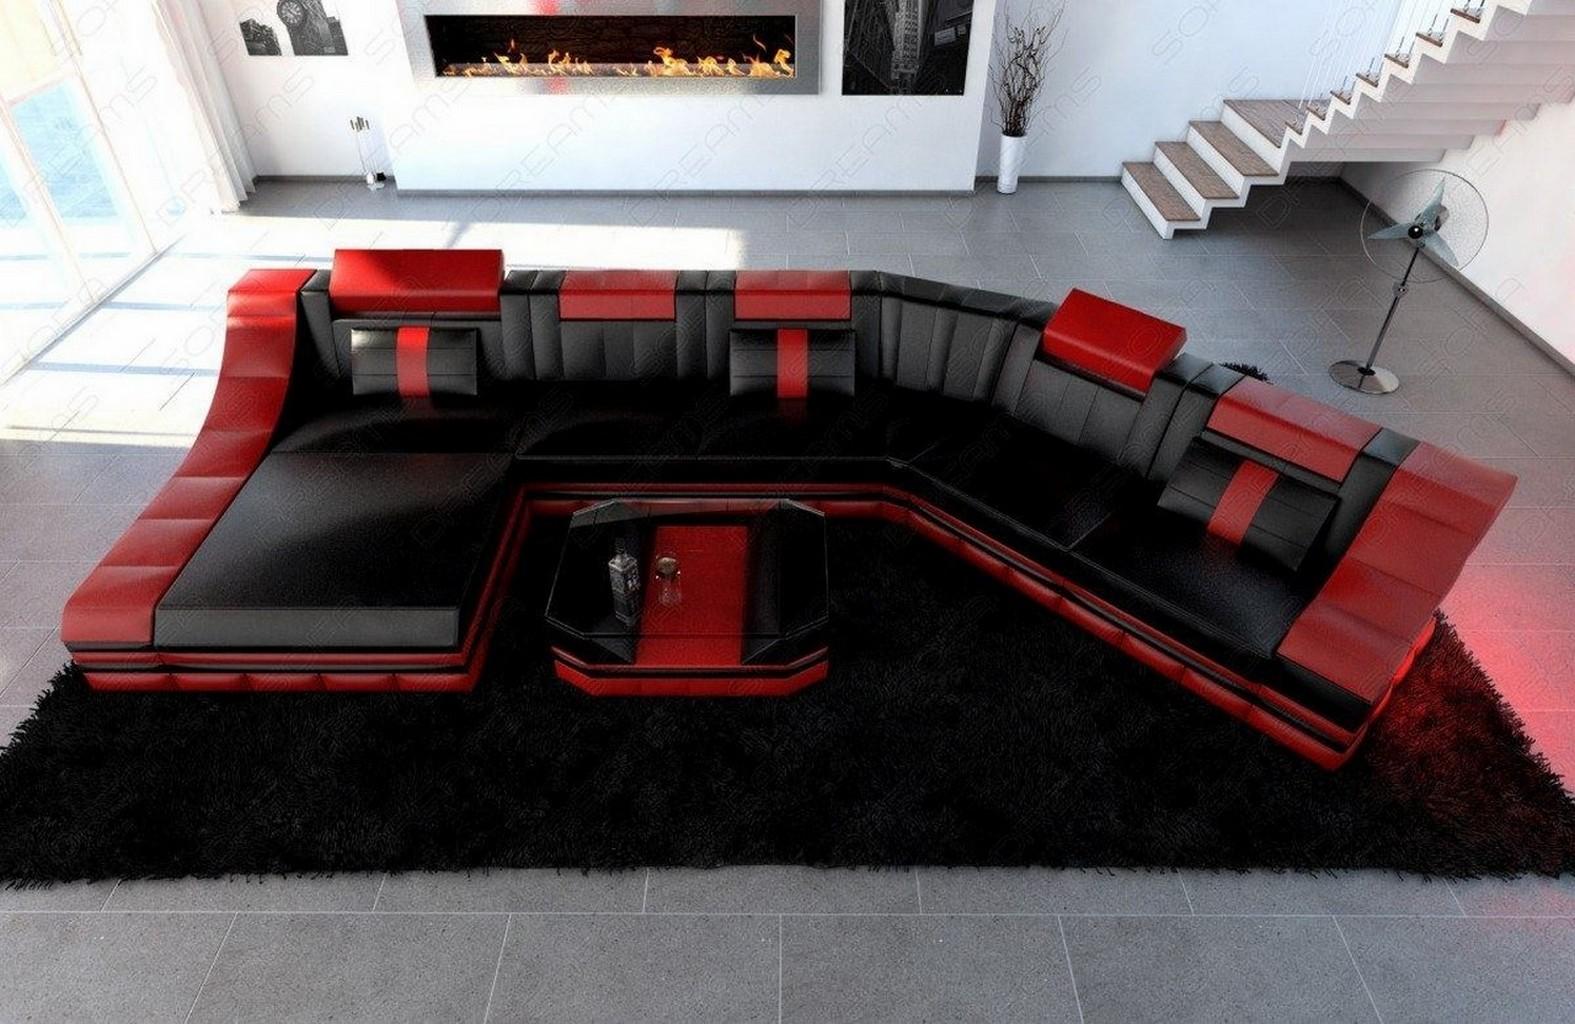 ledergarnitur wohnlandschaft turino cl mit led licht ledersofa couch ecksofa ebay. Black Bedroom Furniture Sets. Home Design Ideas